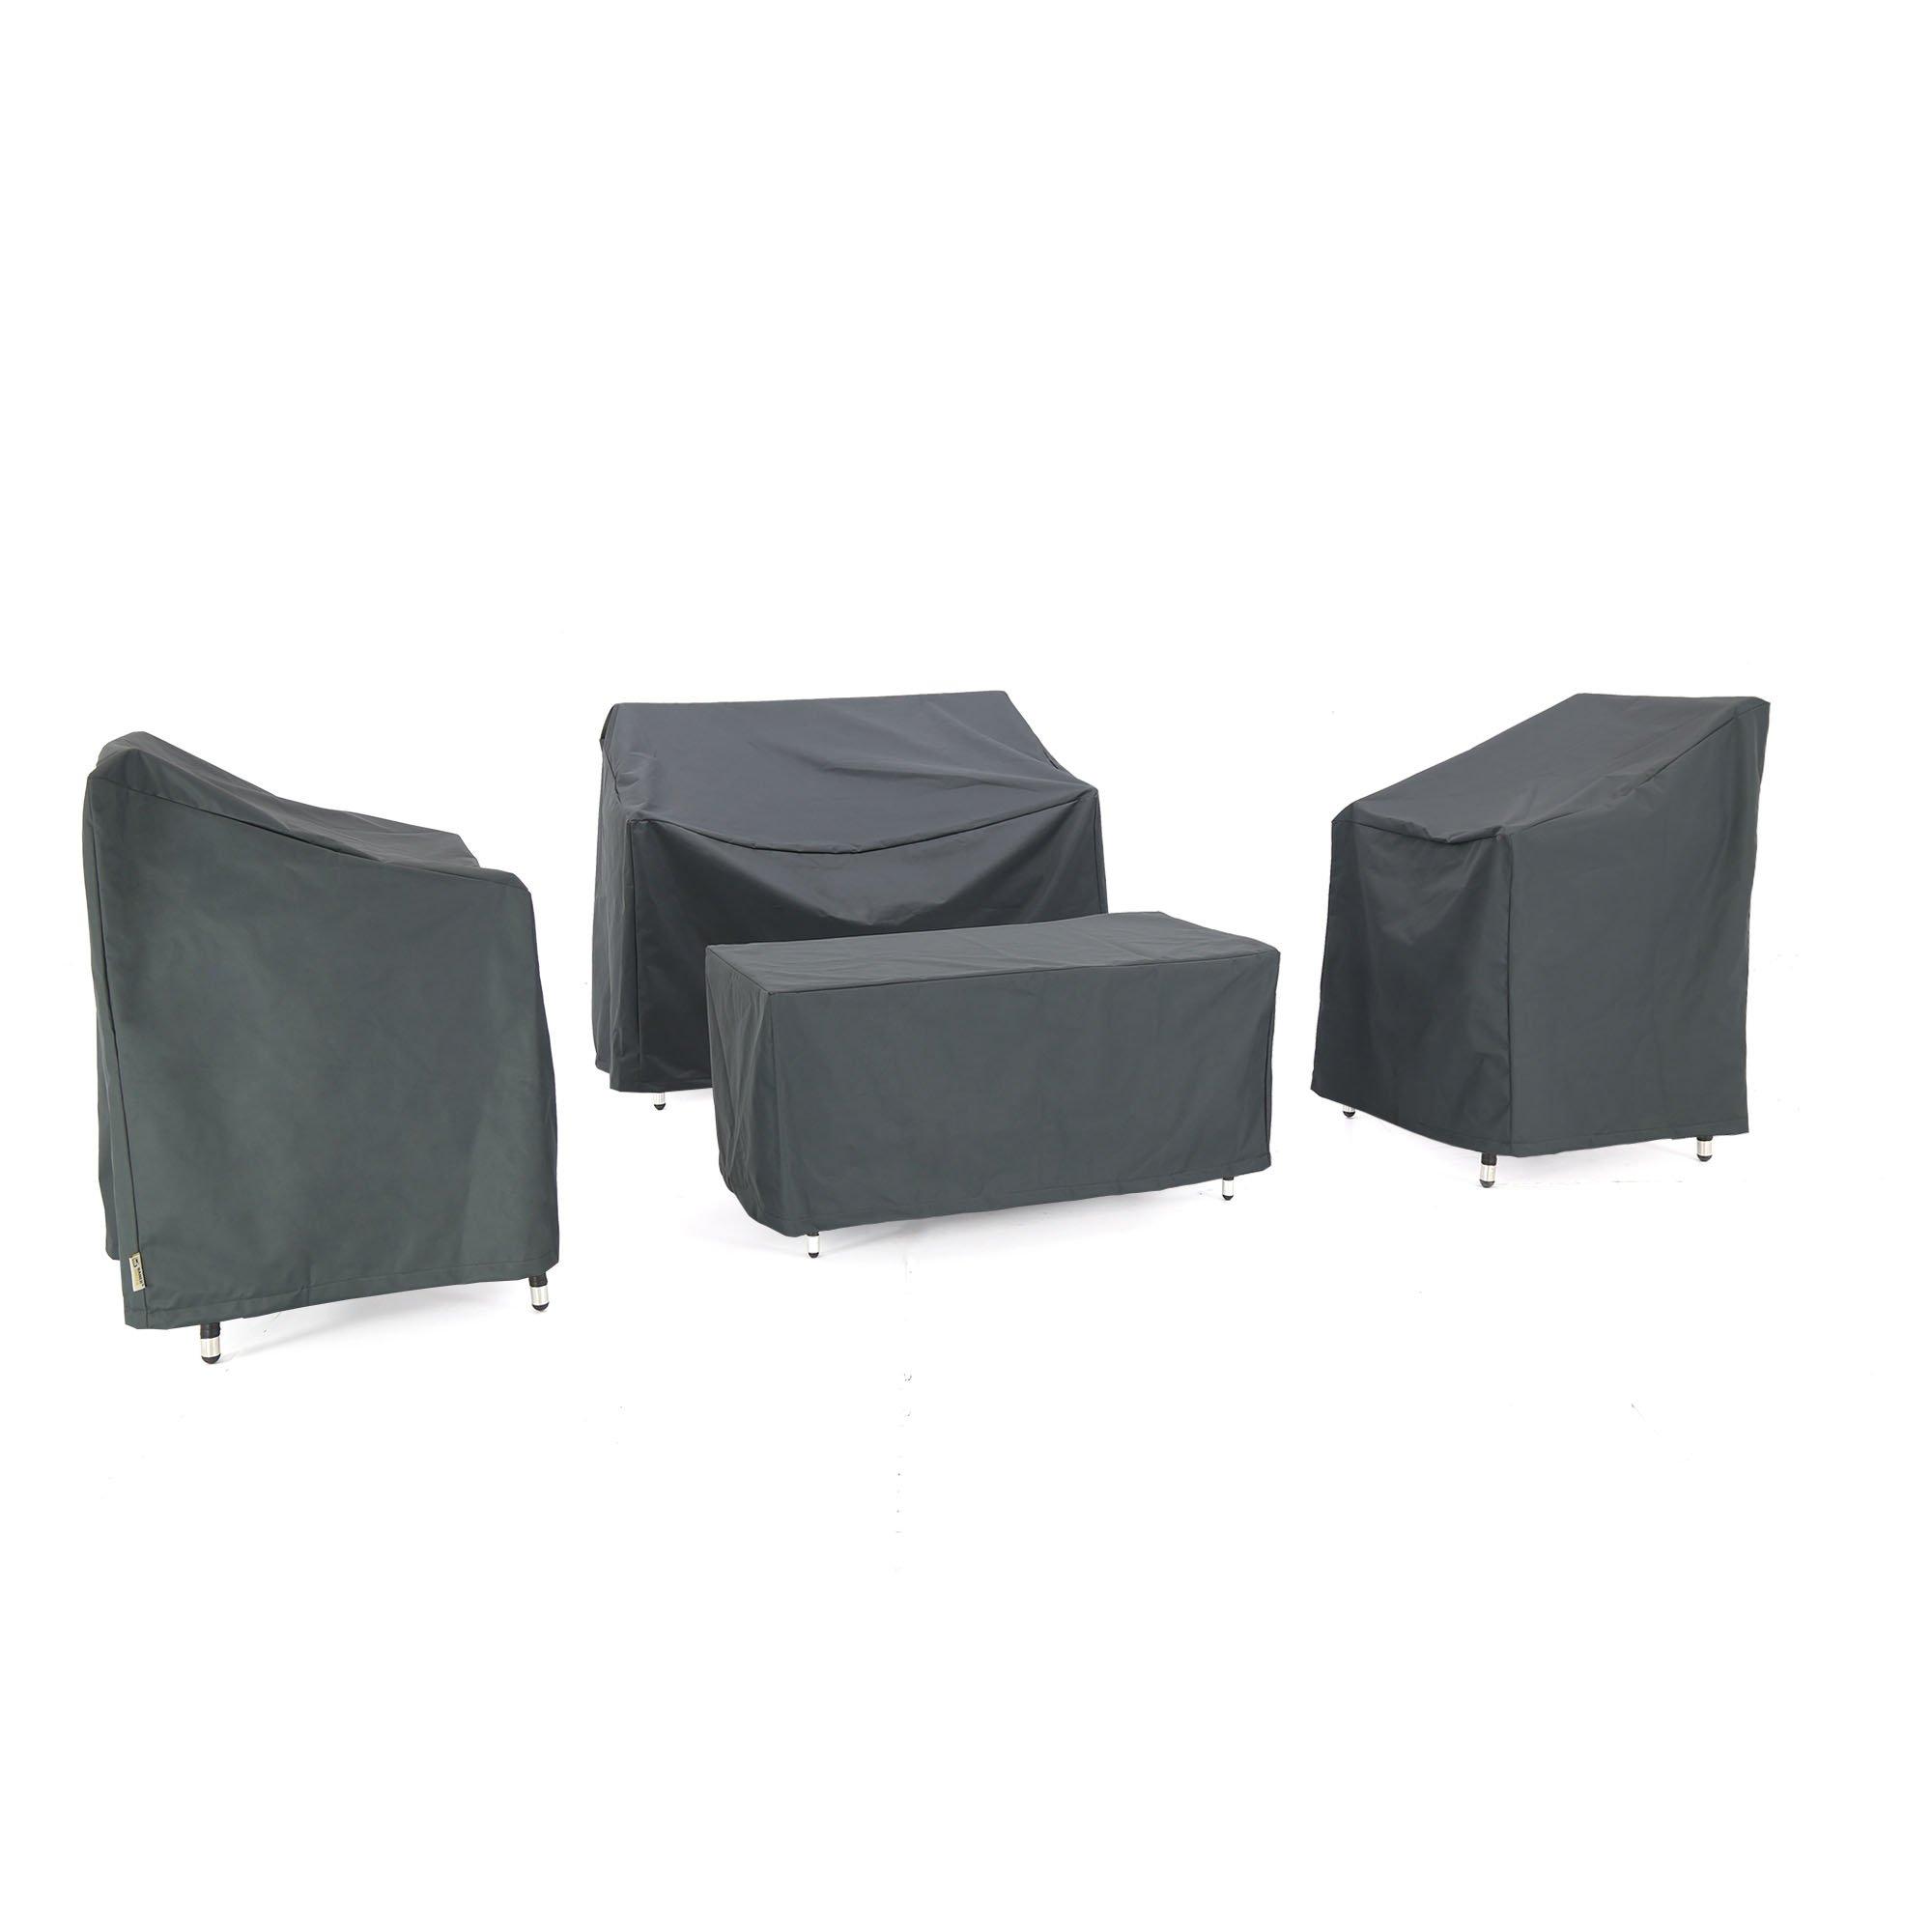 Baner Garden N68 4-piece Outdoor Veranda Patio Garden Furniture Cover Set with Durable and Water Resistant Fabric